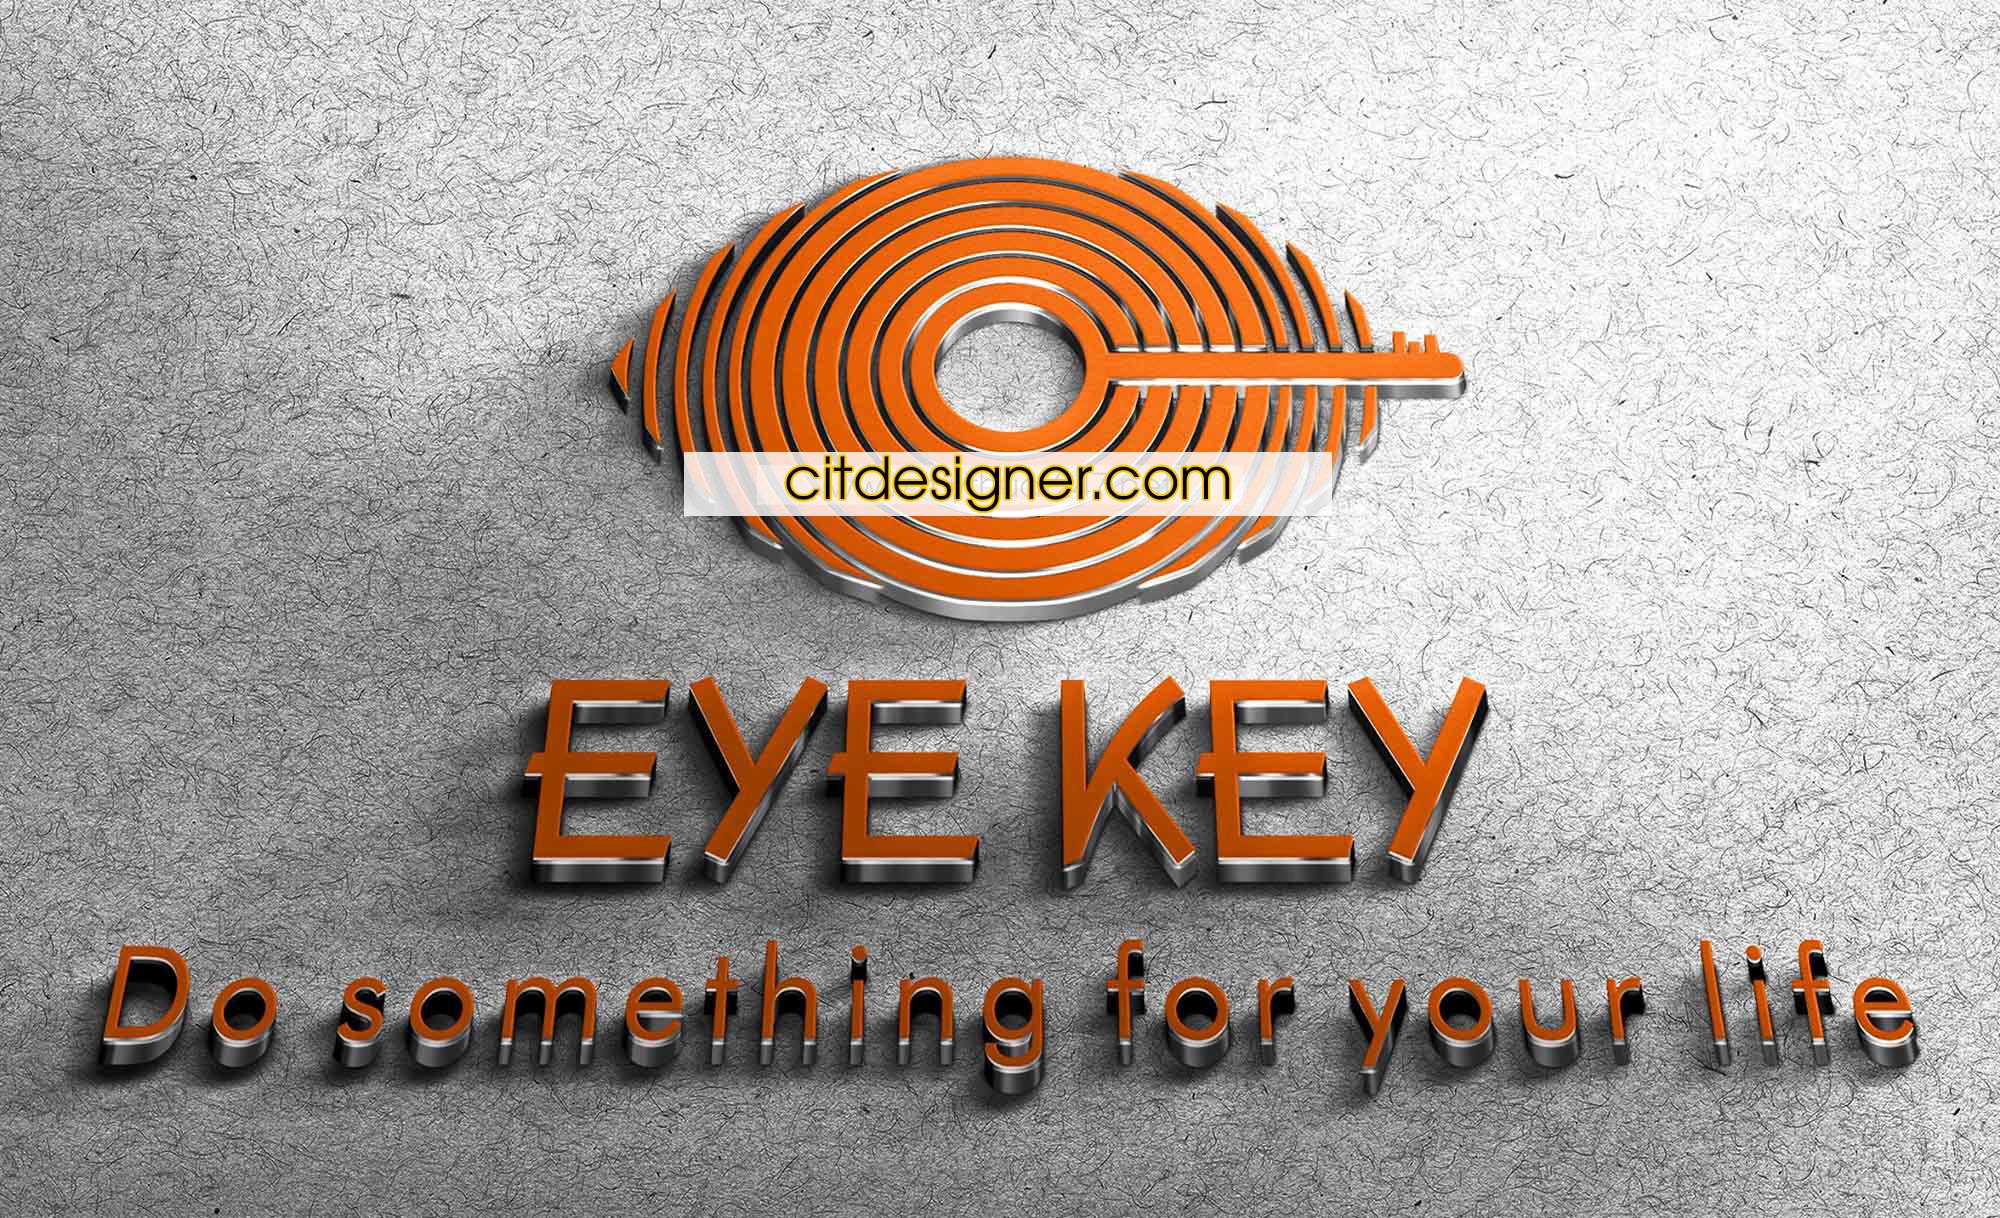 thiet ke logo eye key